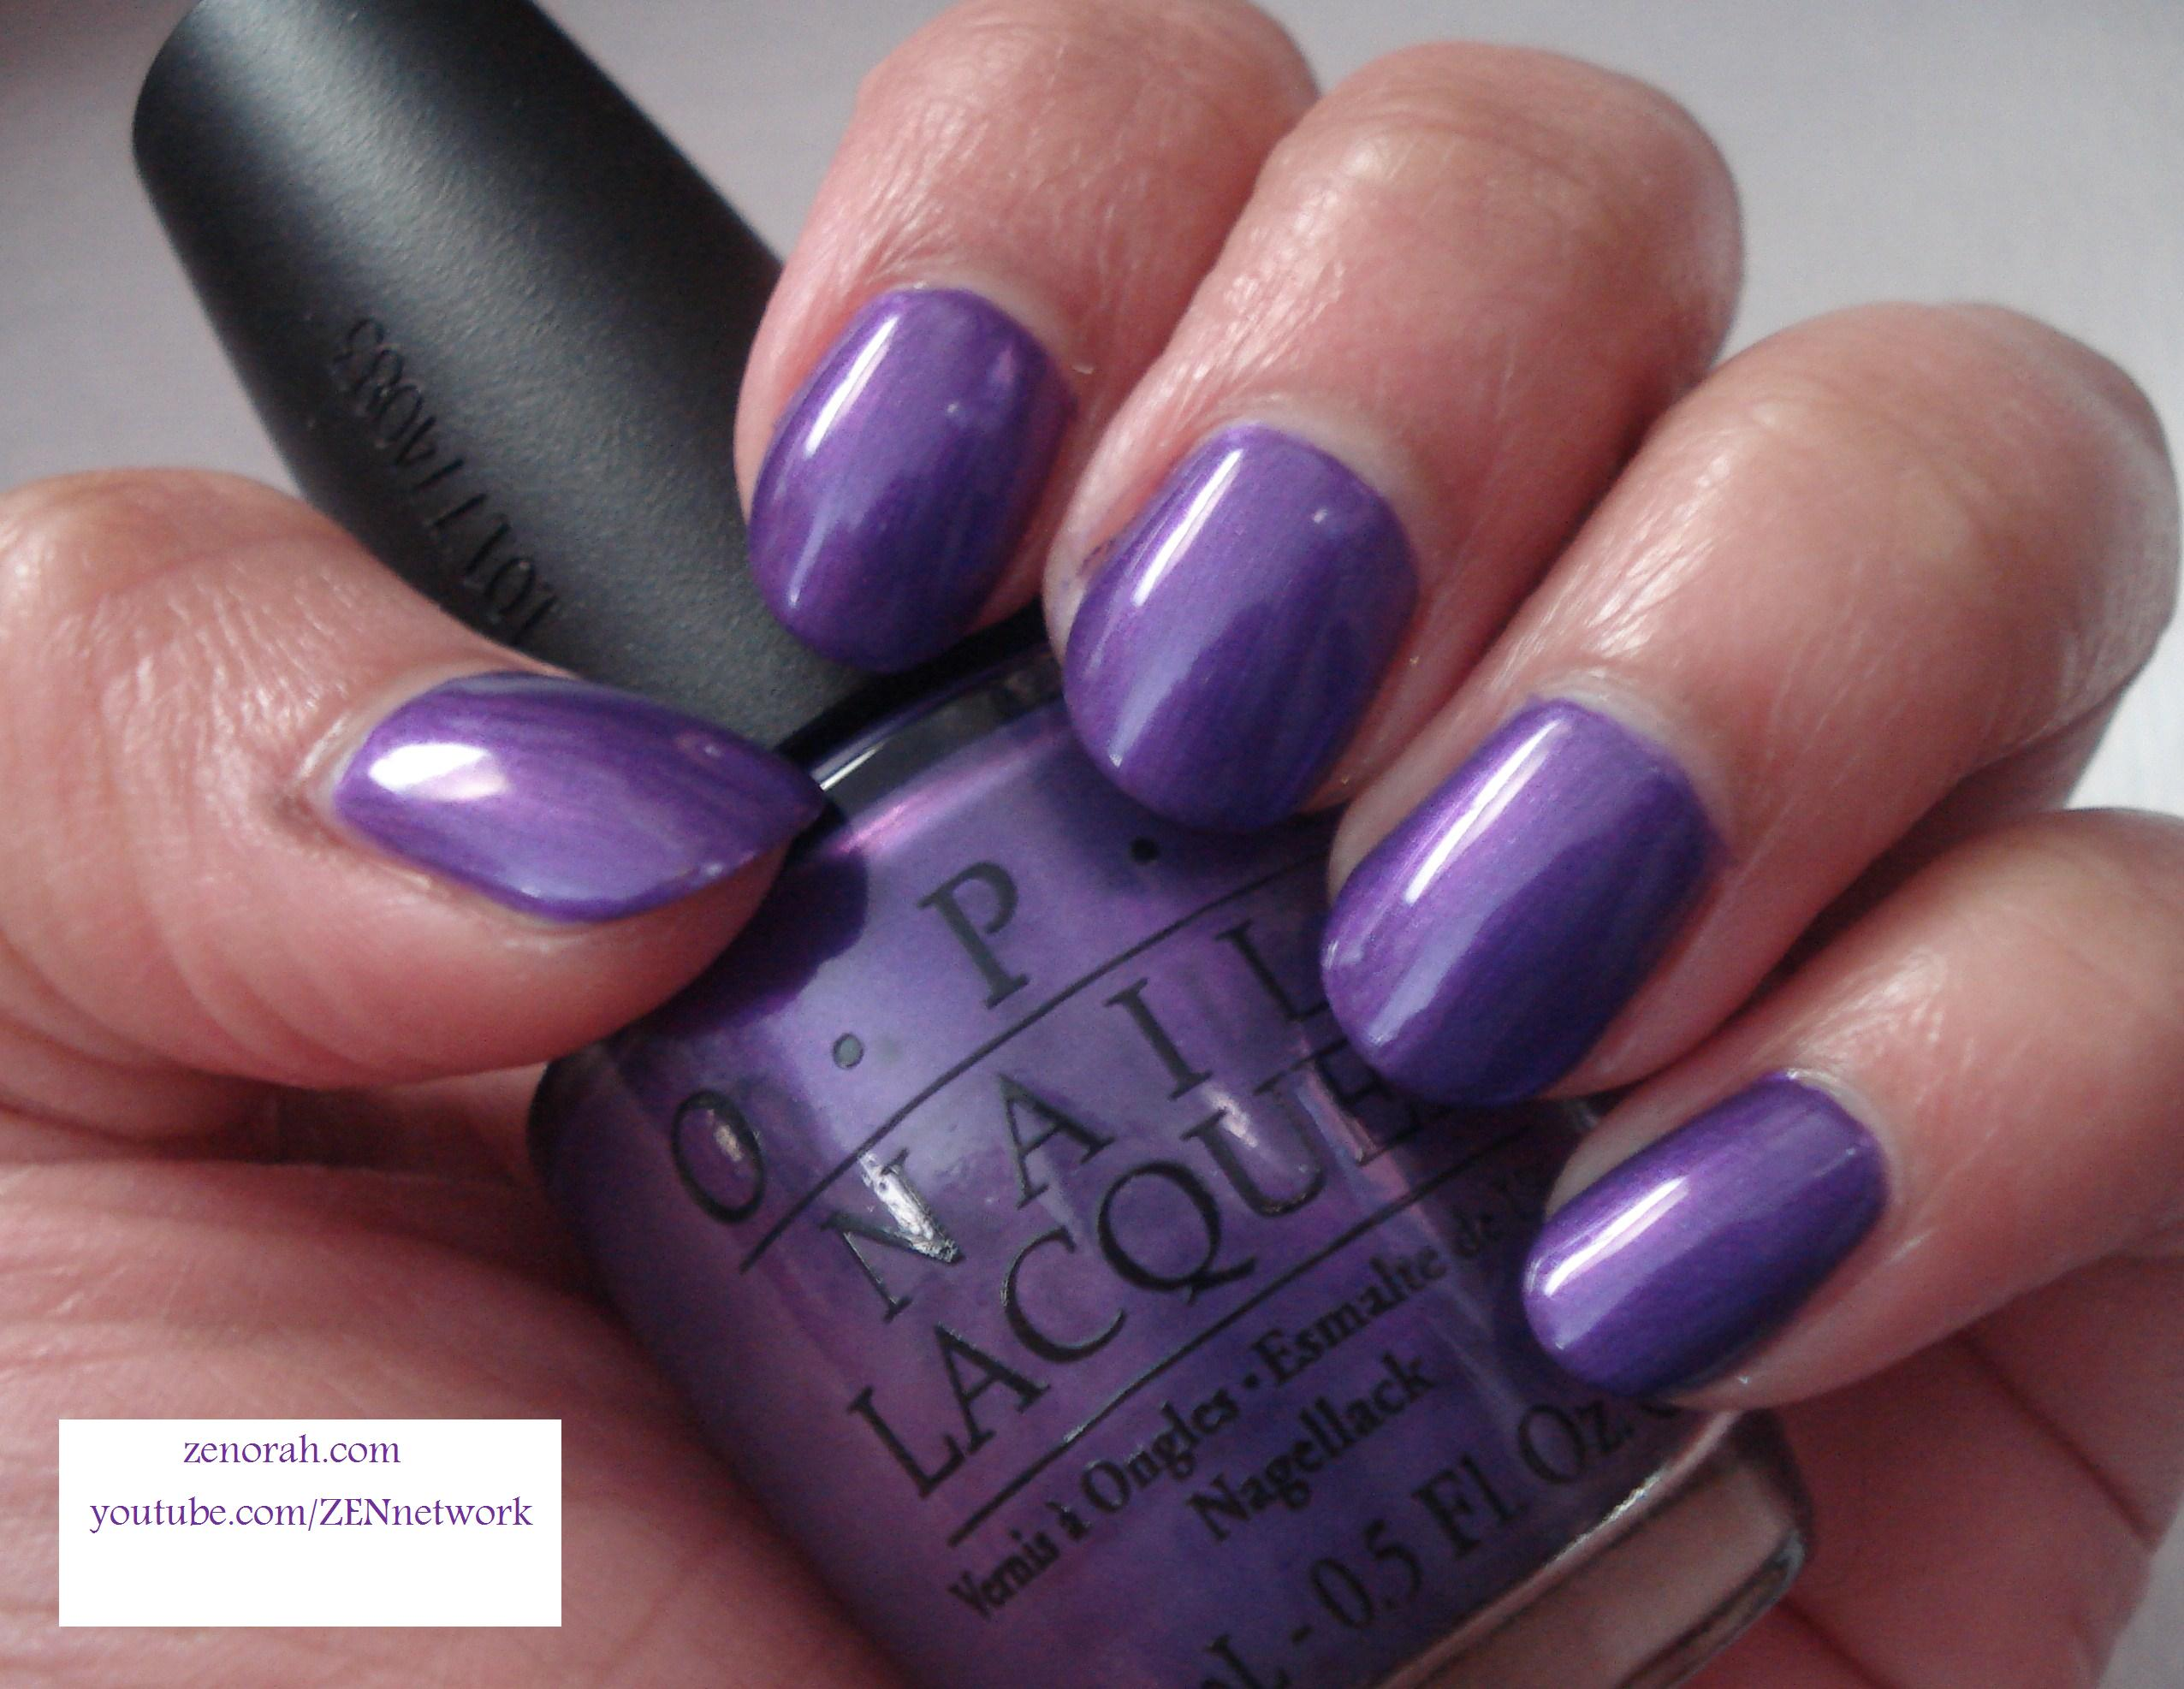 OPI Purple With a Purpose – Zenorah